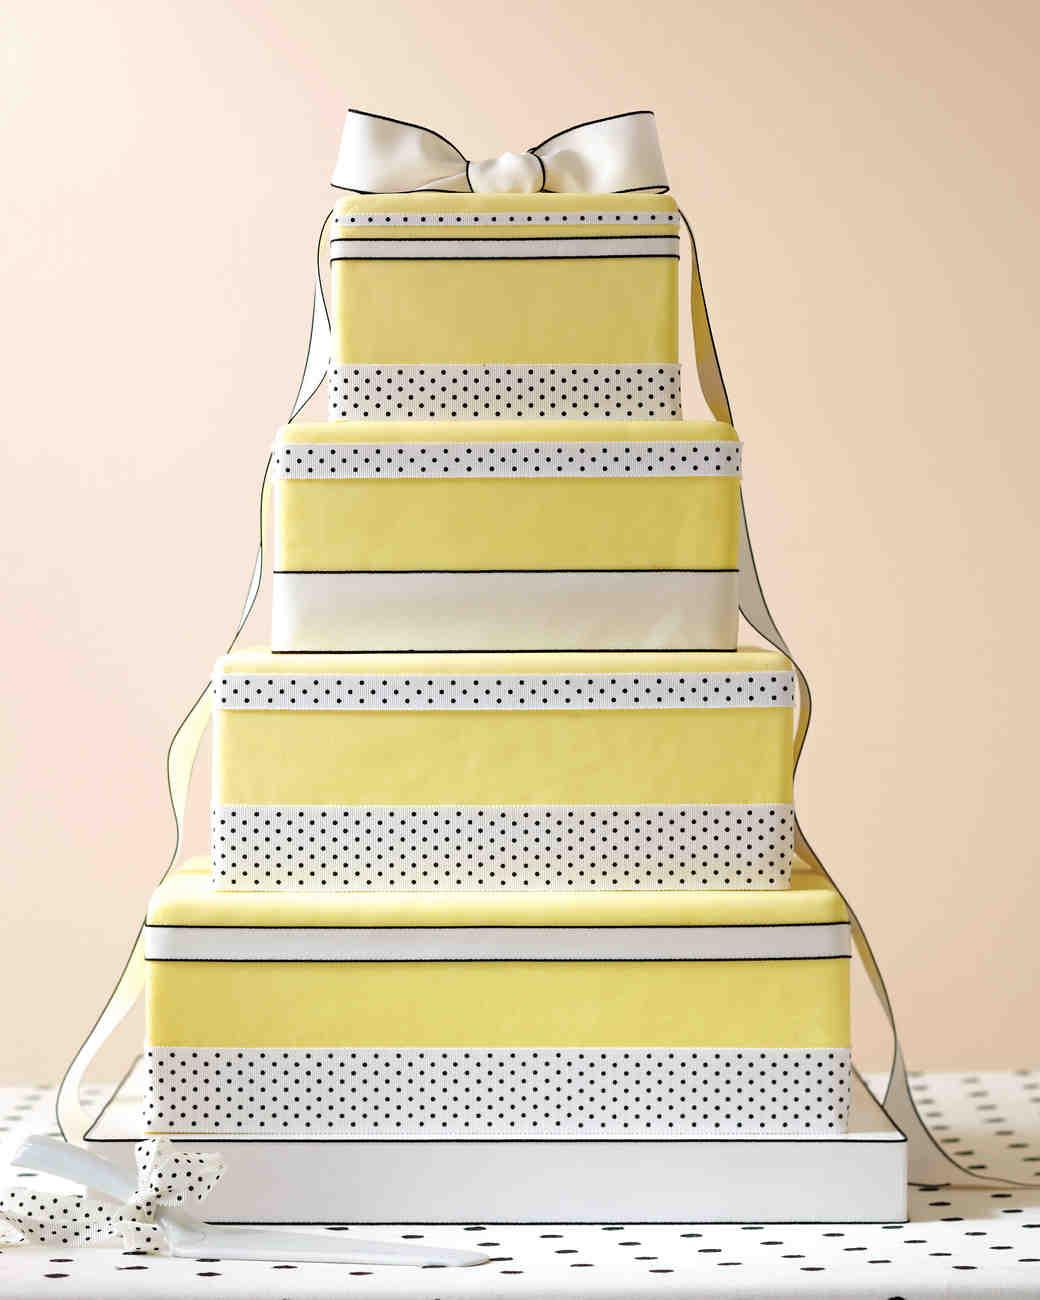 cakes01a-sum11mwd107083.jpg